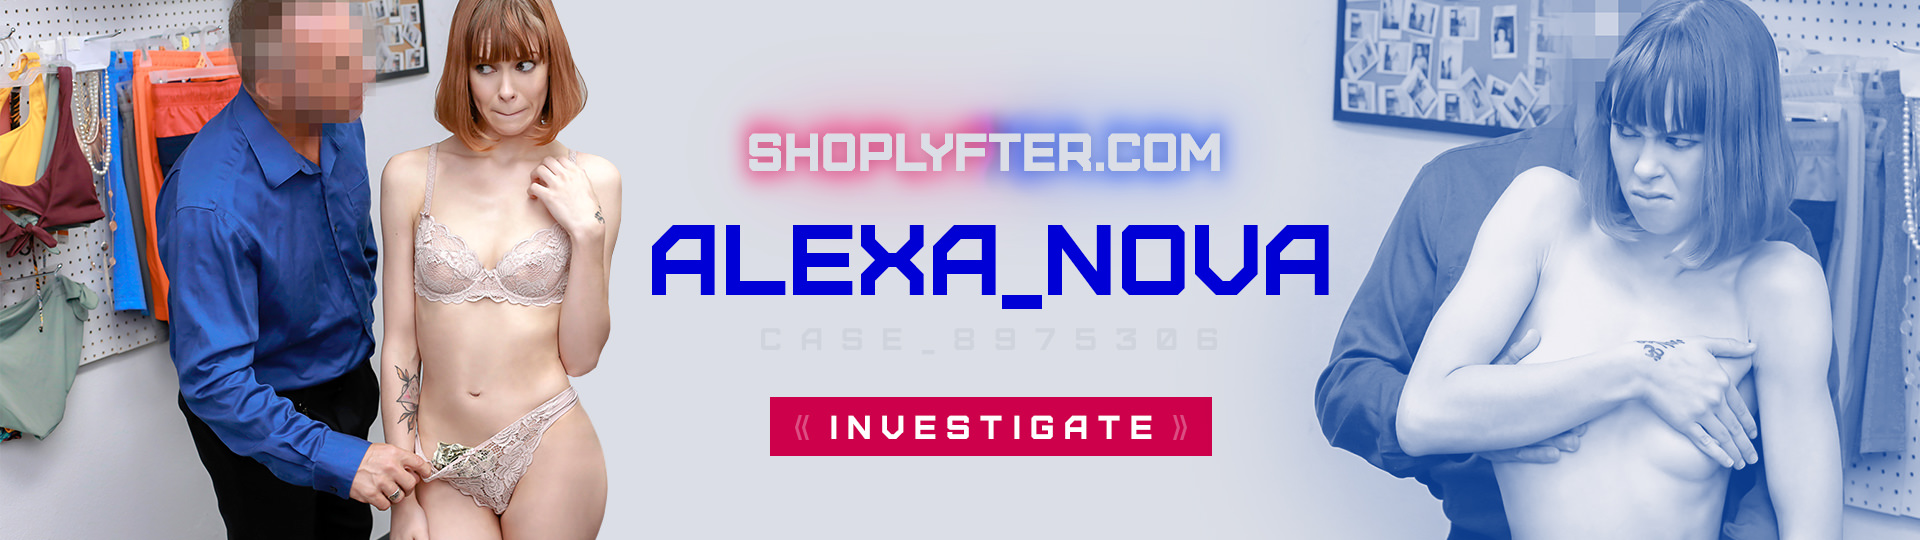 ShopLyfter.com